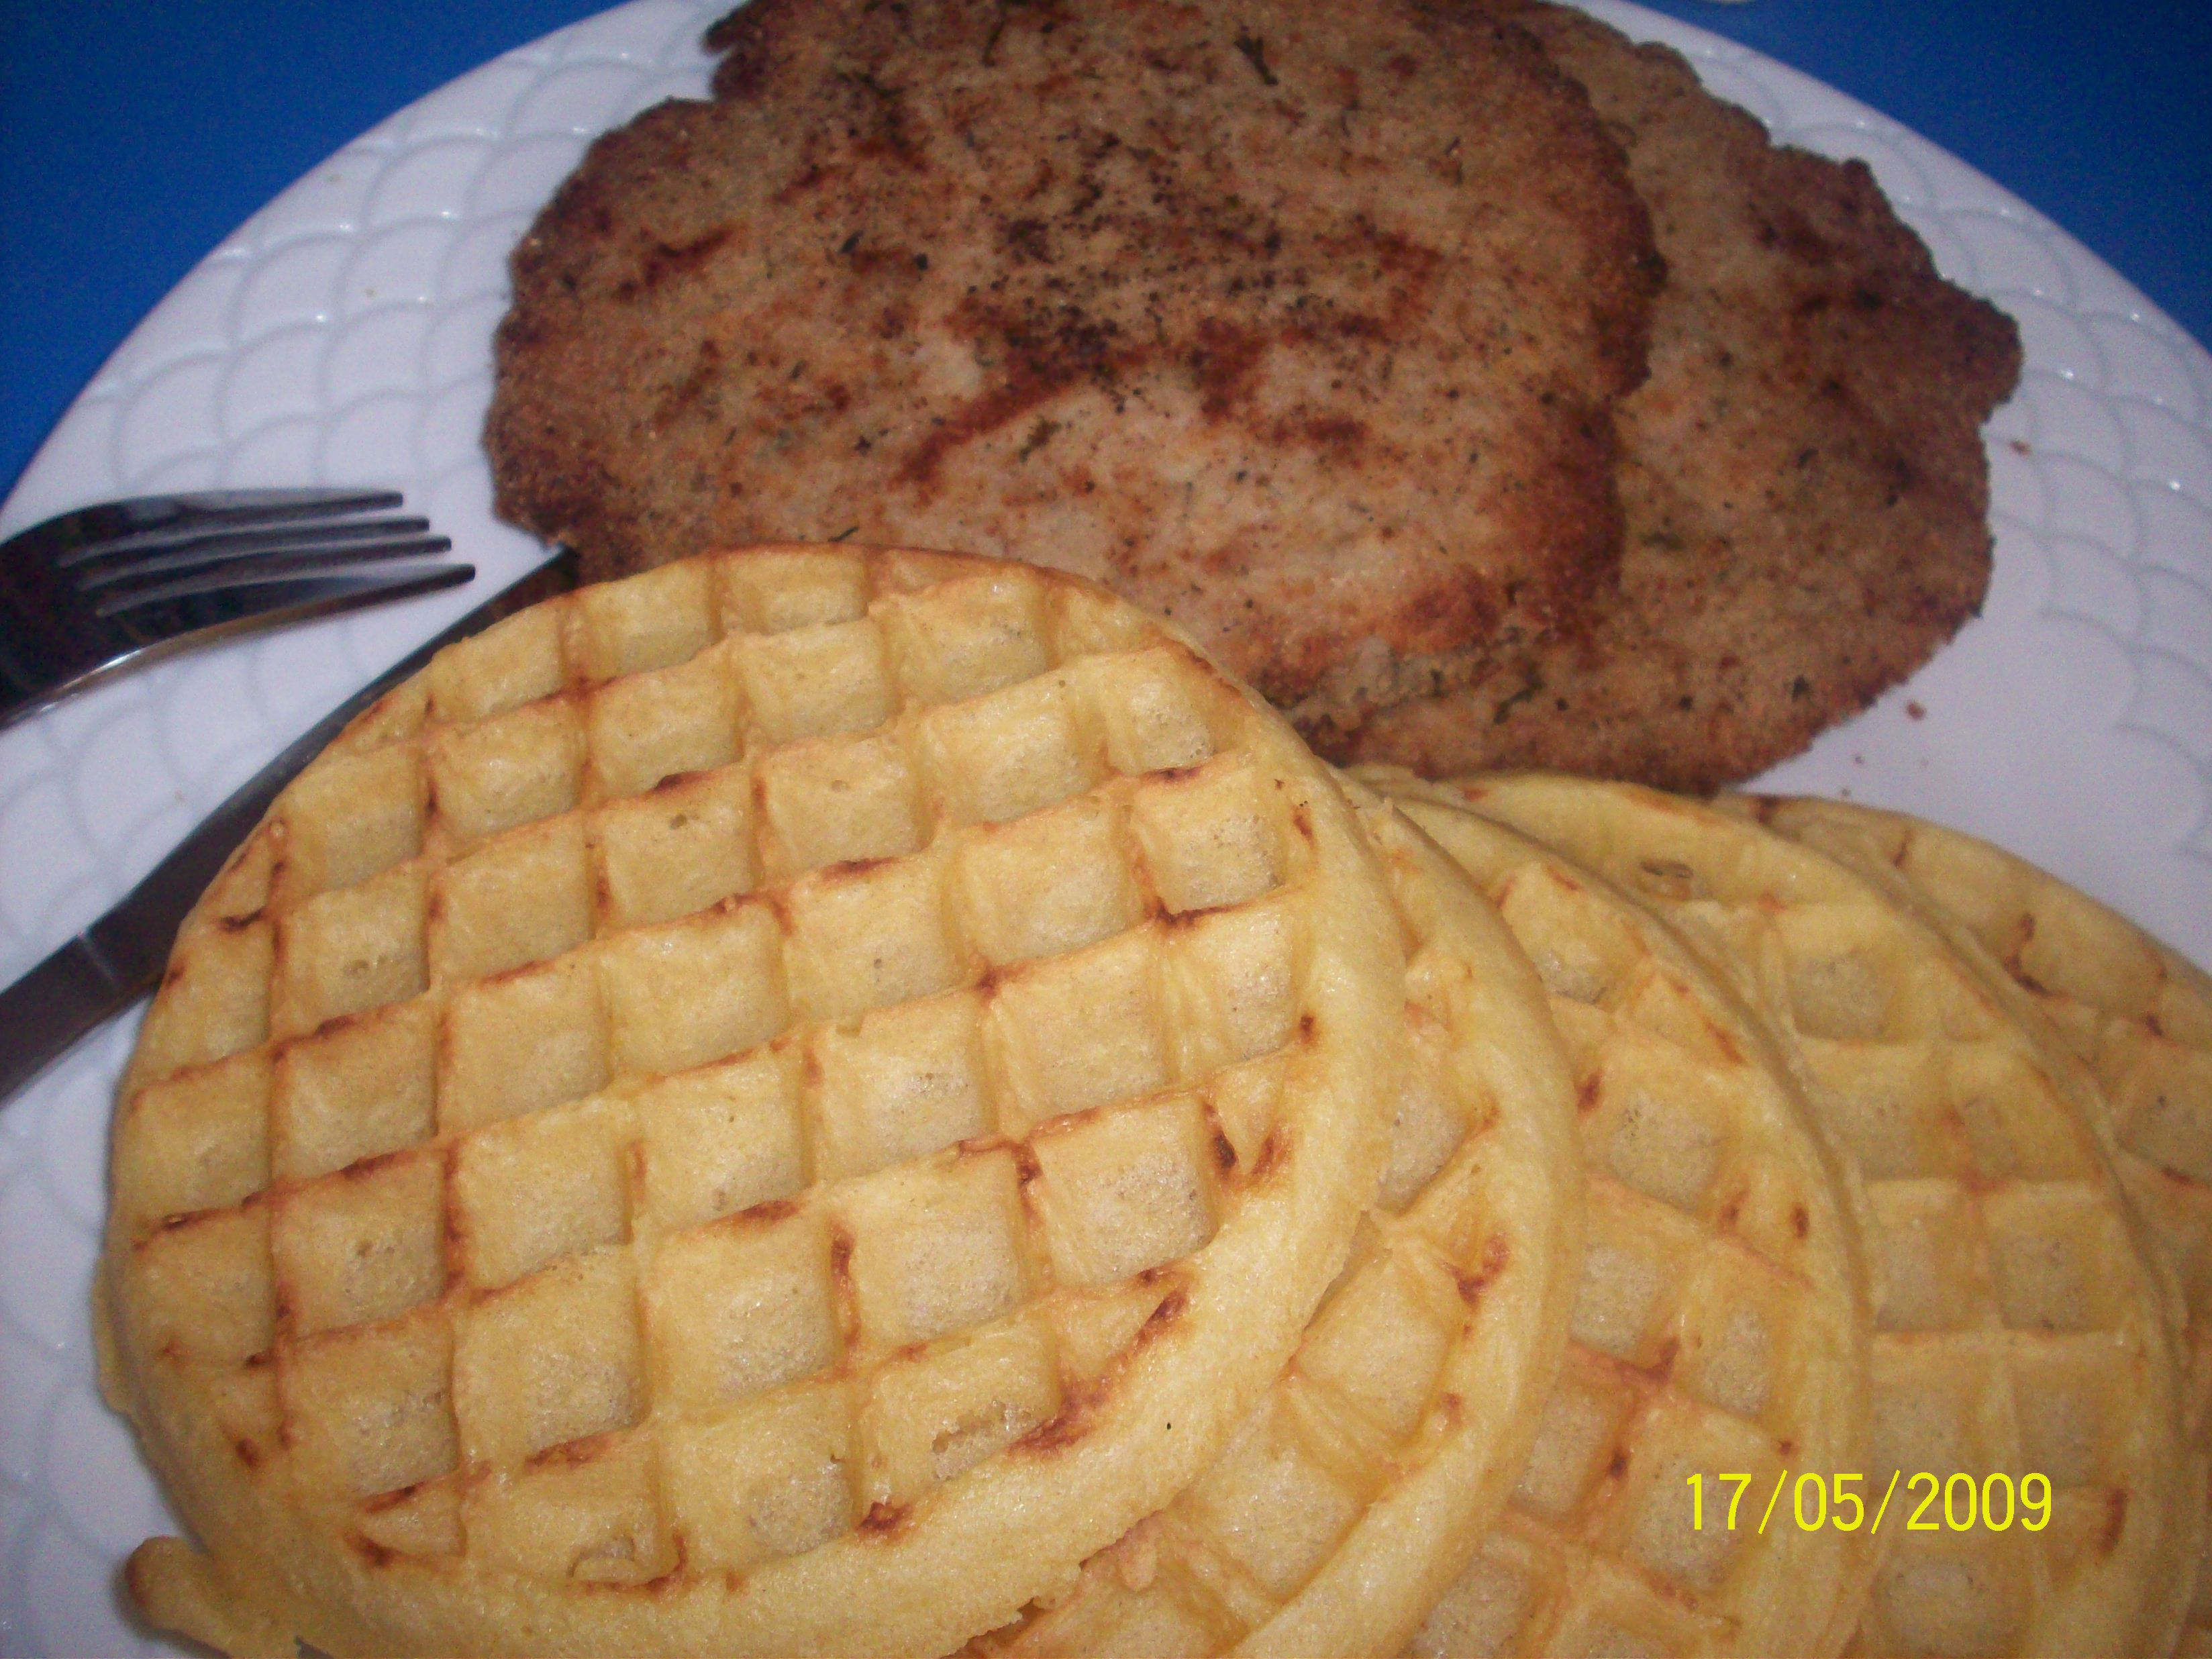 https://foodloader.net/cutie_2009-05-17_Waffles_and_Salmon_Cake.jpg